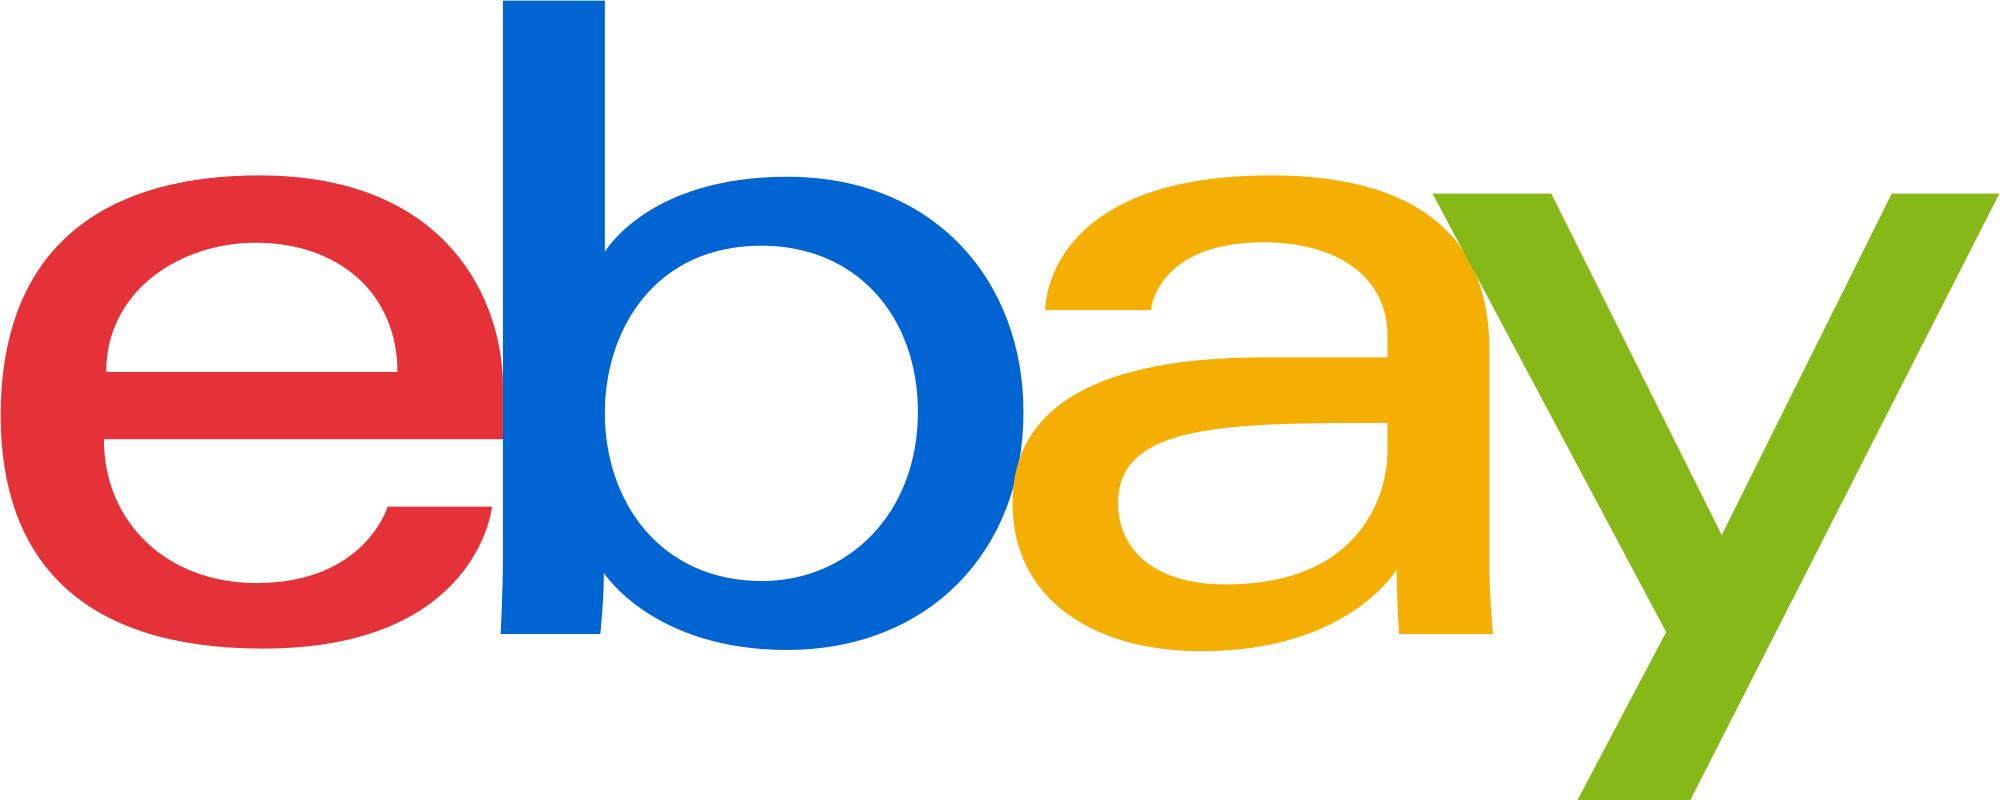 eBay.nl — 10 EUR zniżki, MWZ: 20 EUR